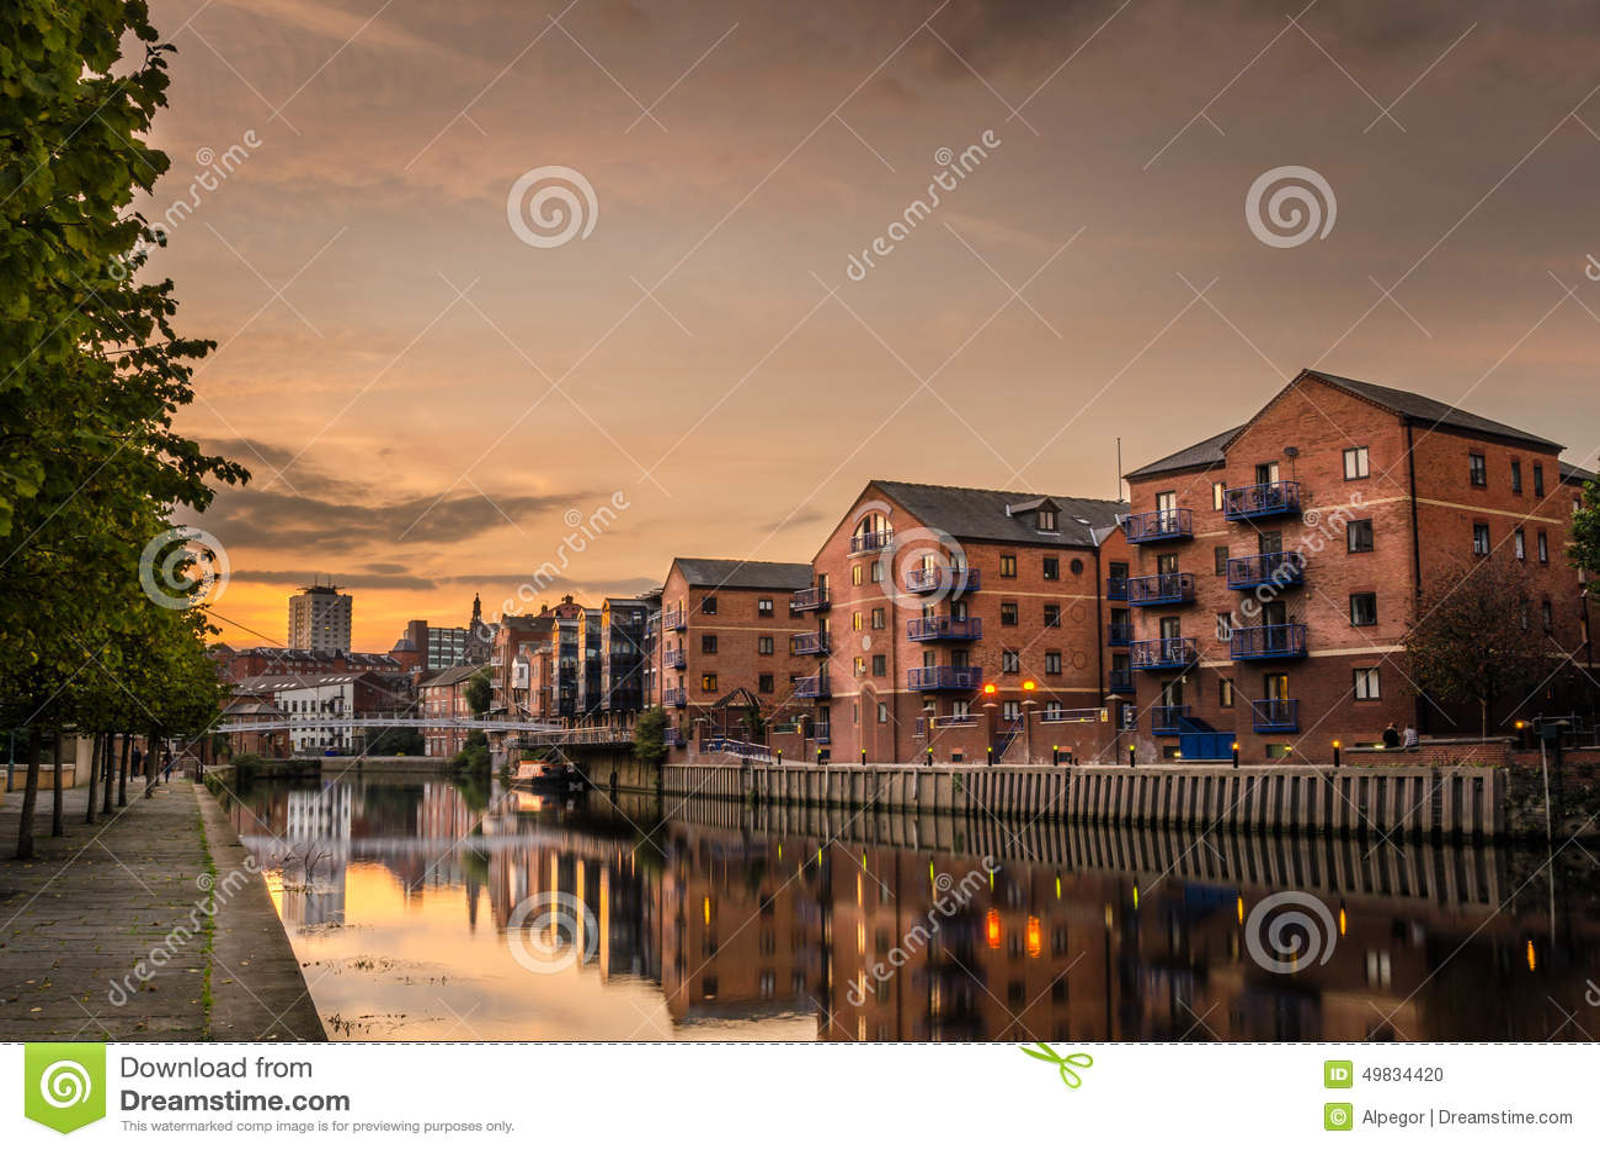 Riverside Buildings at Sunset